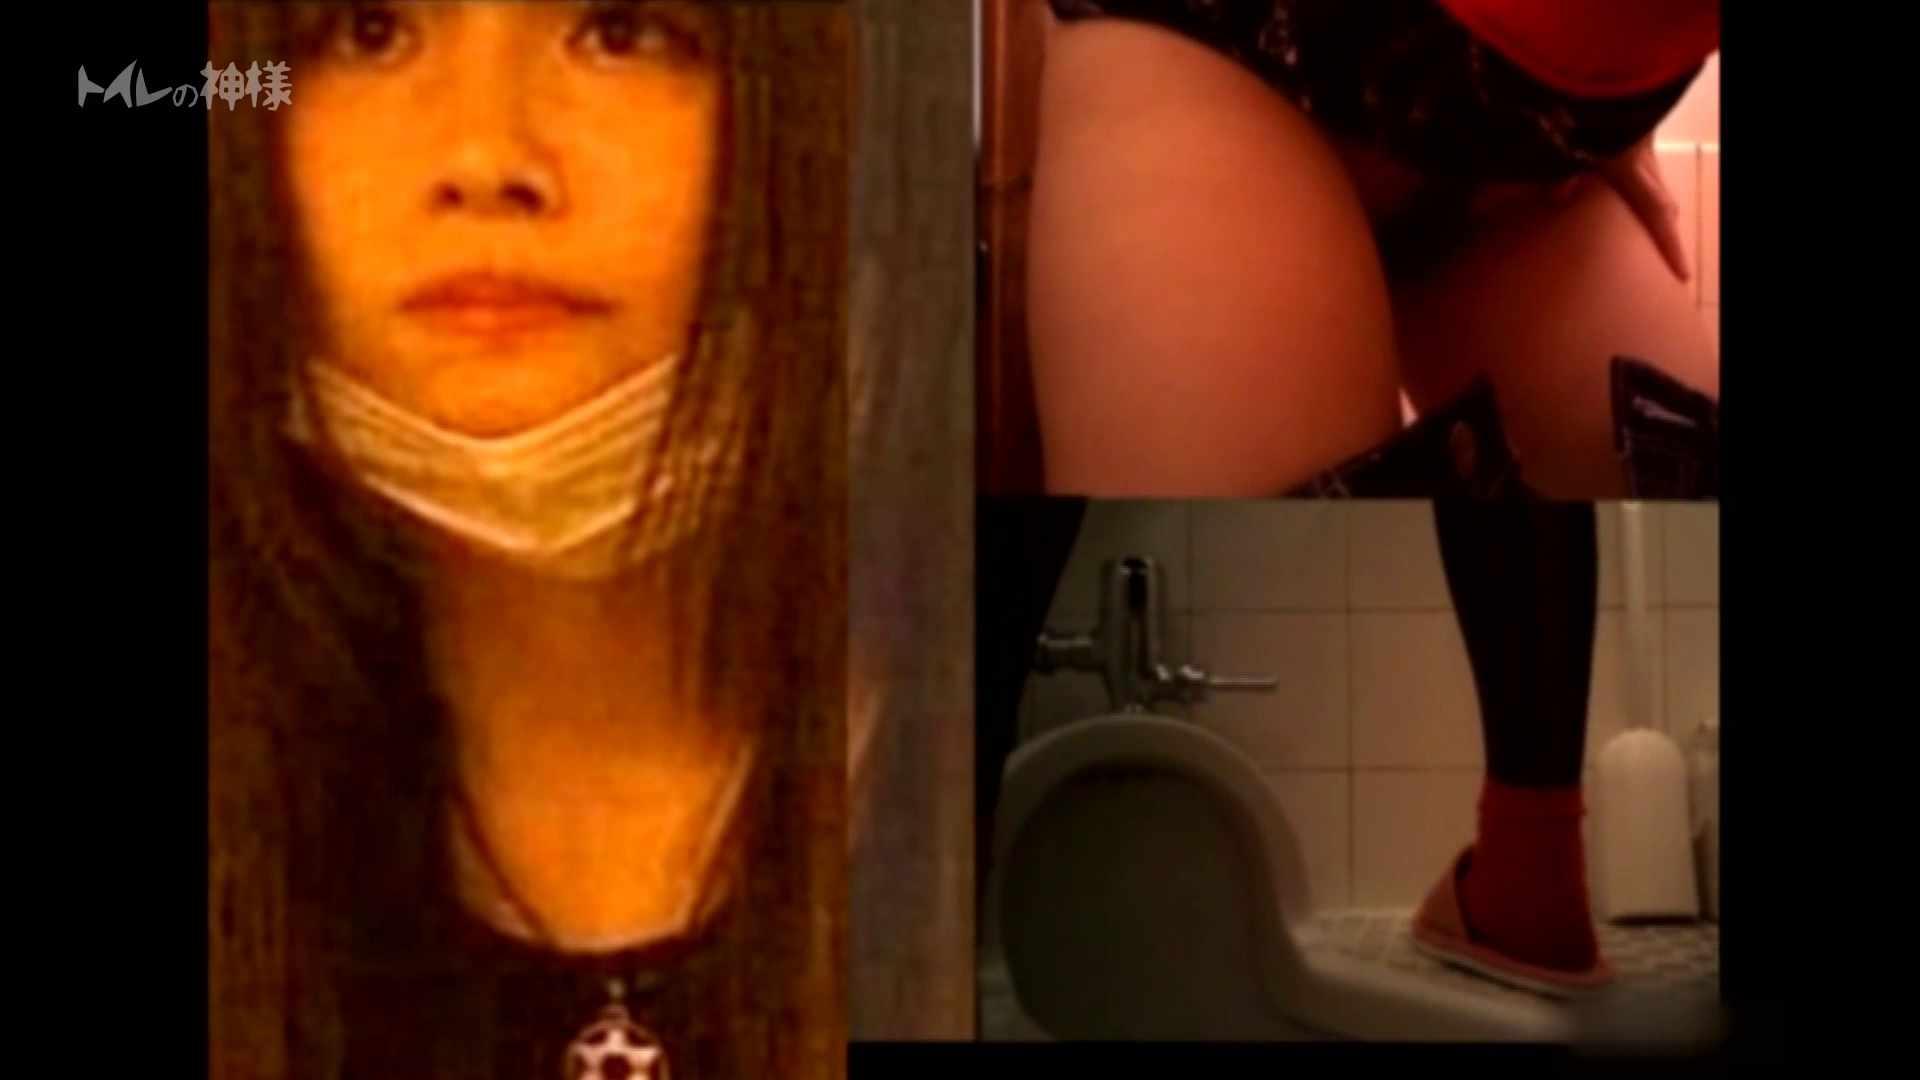 Vol.02 花の女子大生うんこ盗撮2 萌え女子大生 | 女体盗撮  97連発 61